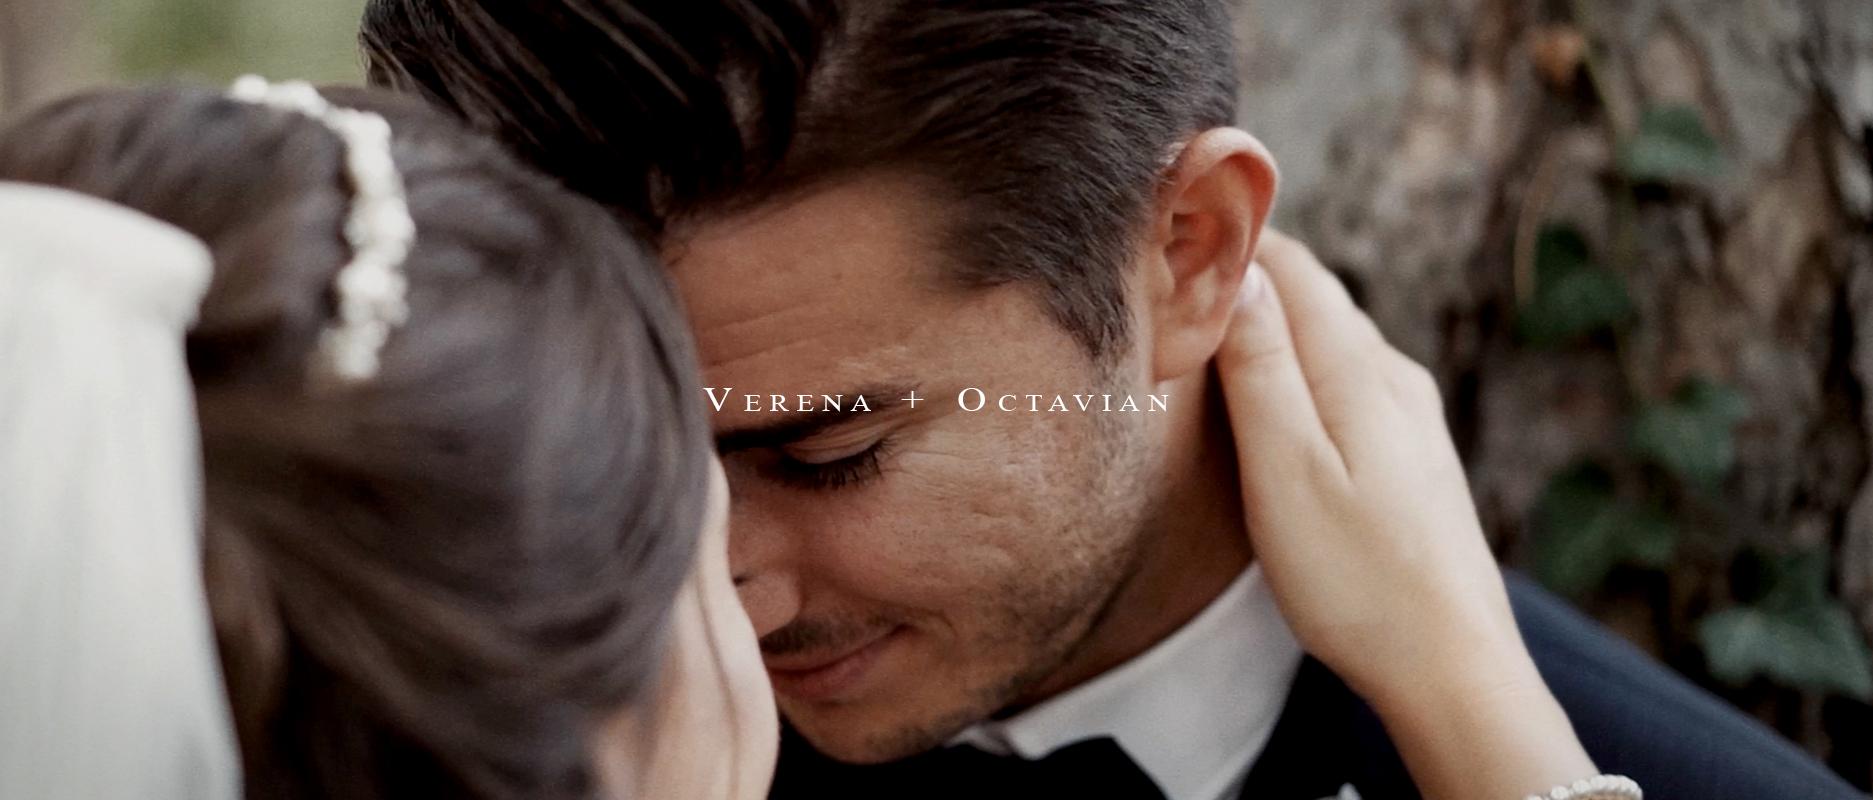 Verena + Octavian | Mödling, Austria | Kursalon Mödling